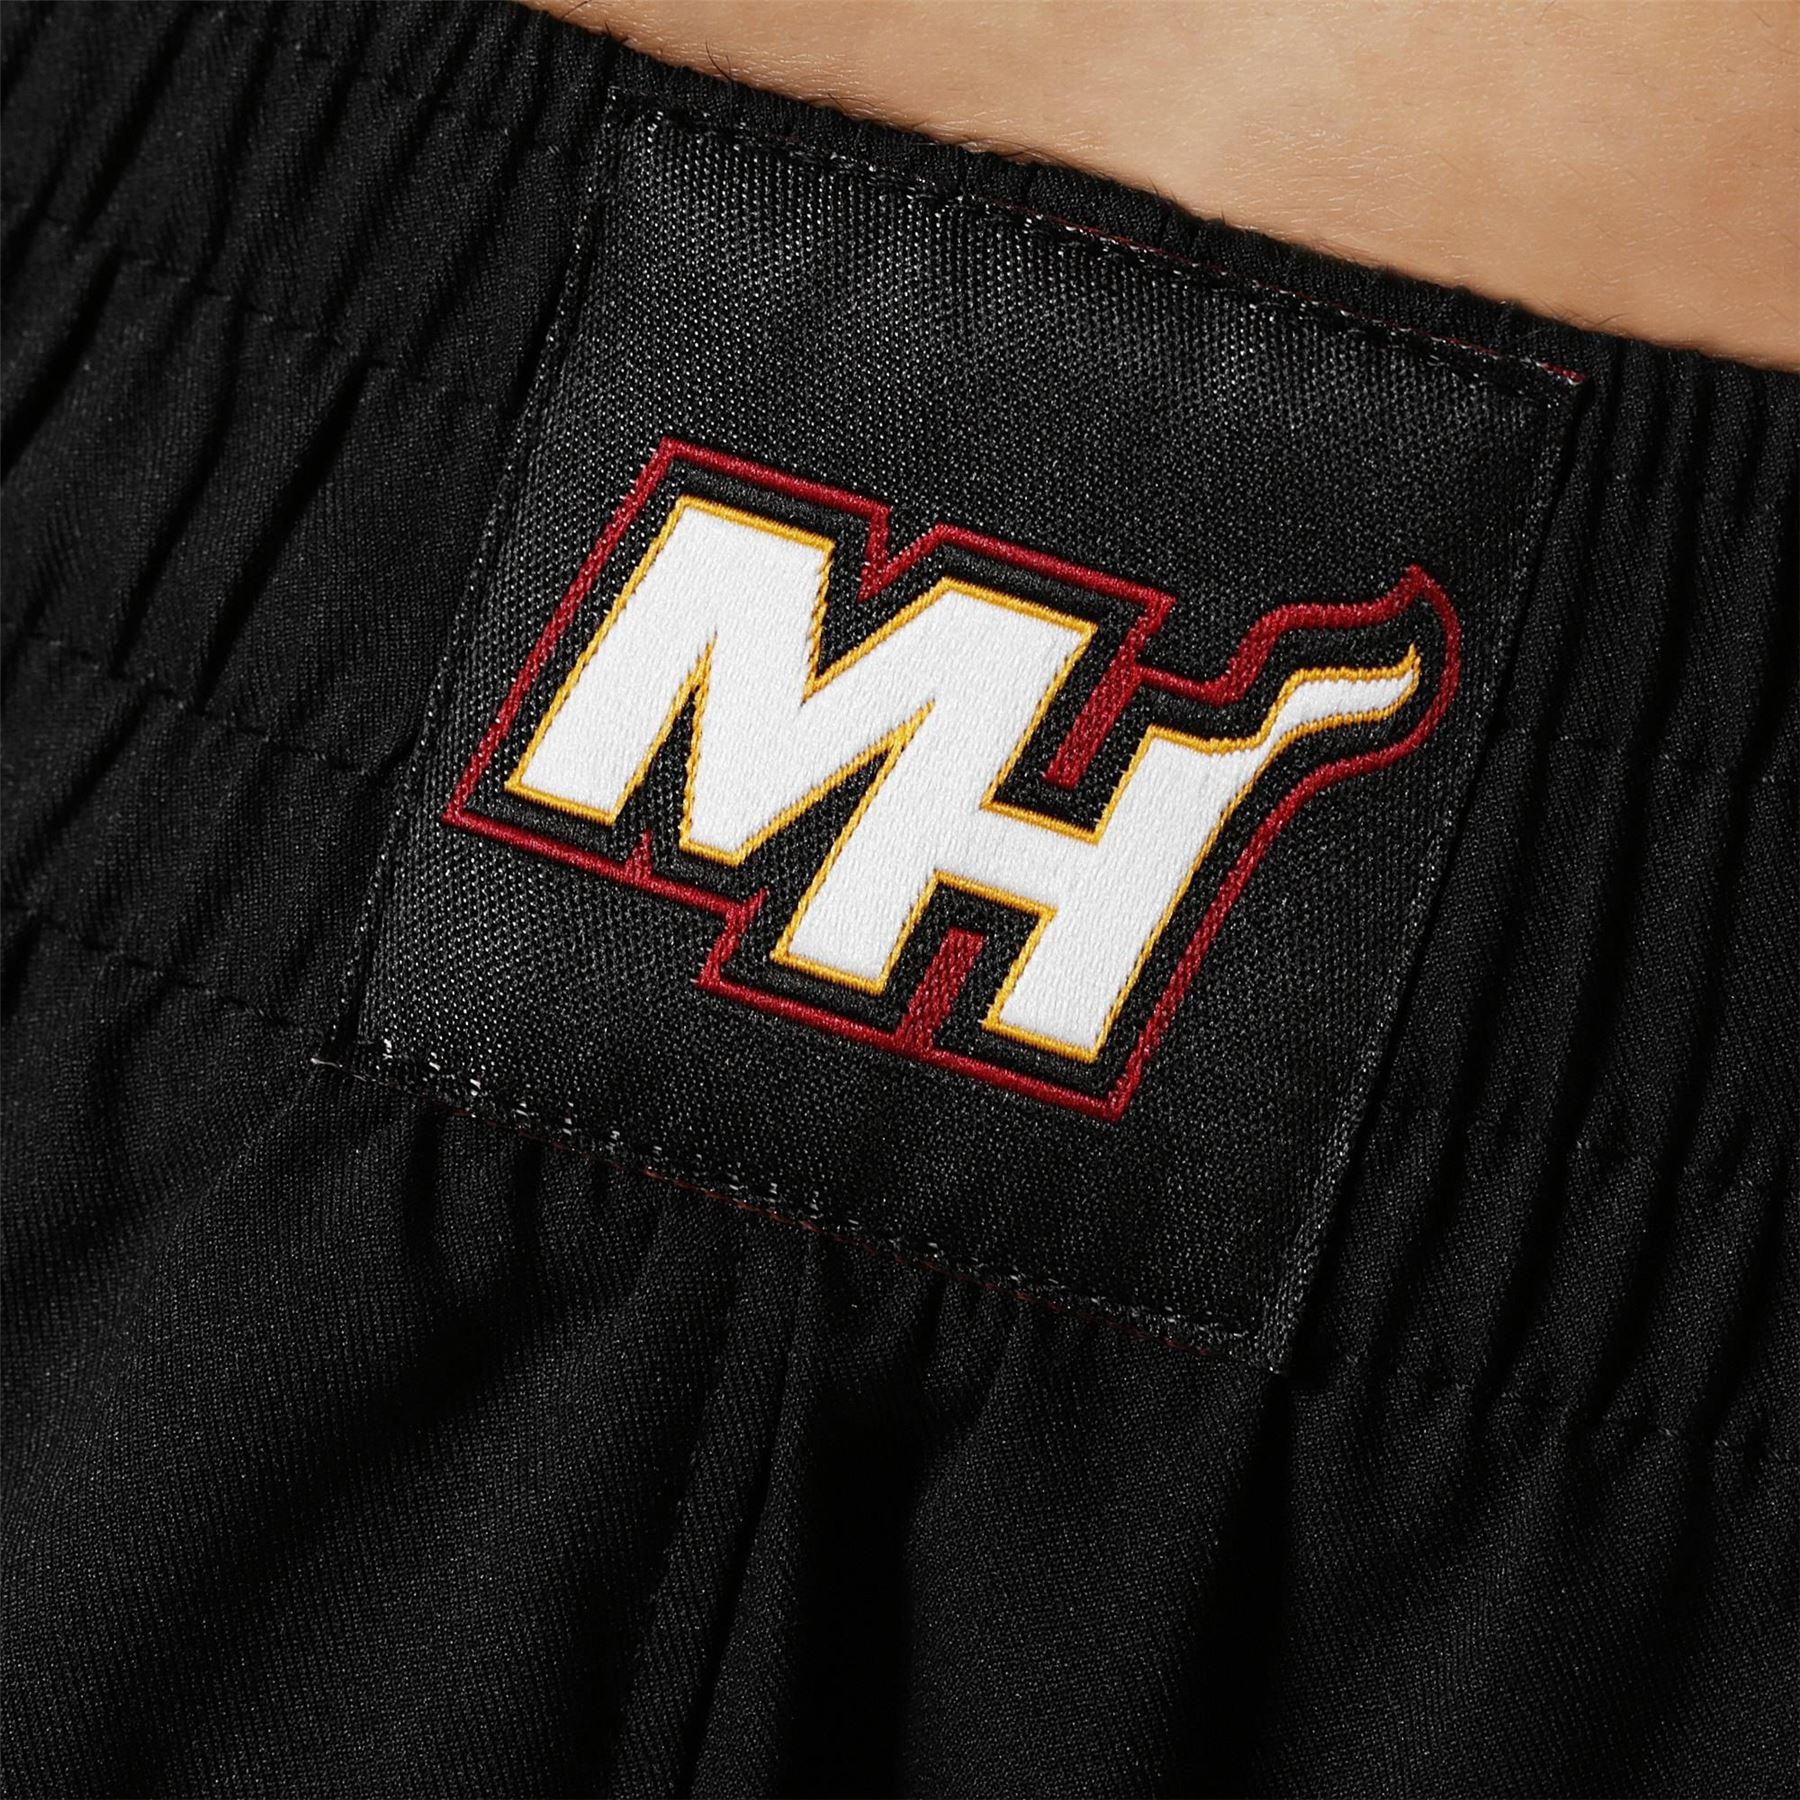 adidas MIAMI HEAT INTERNATIONAL NBA SWINGMAN SHORTS BLACK BASKETBALL MEN S 2799f63f6c2f